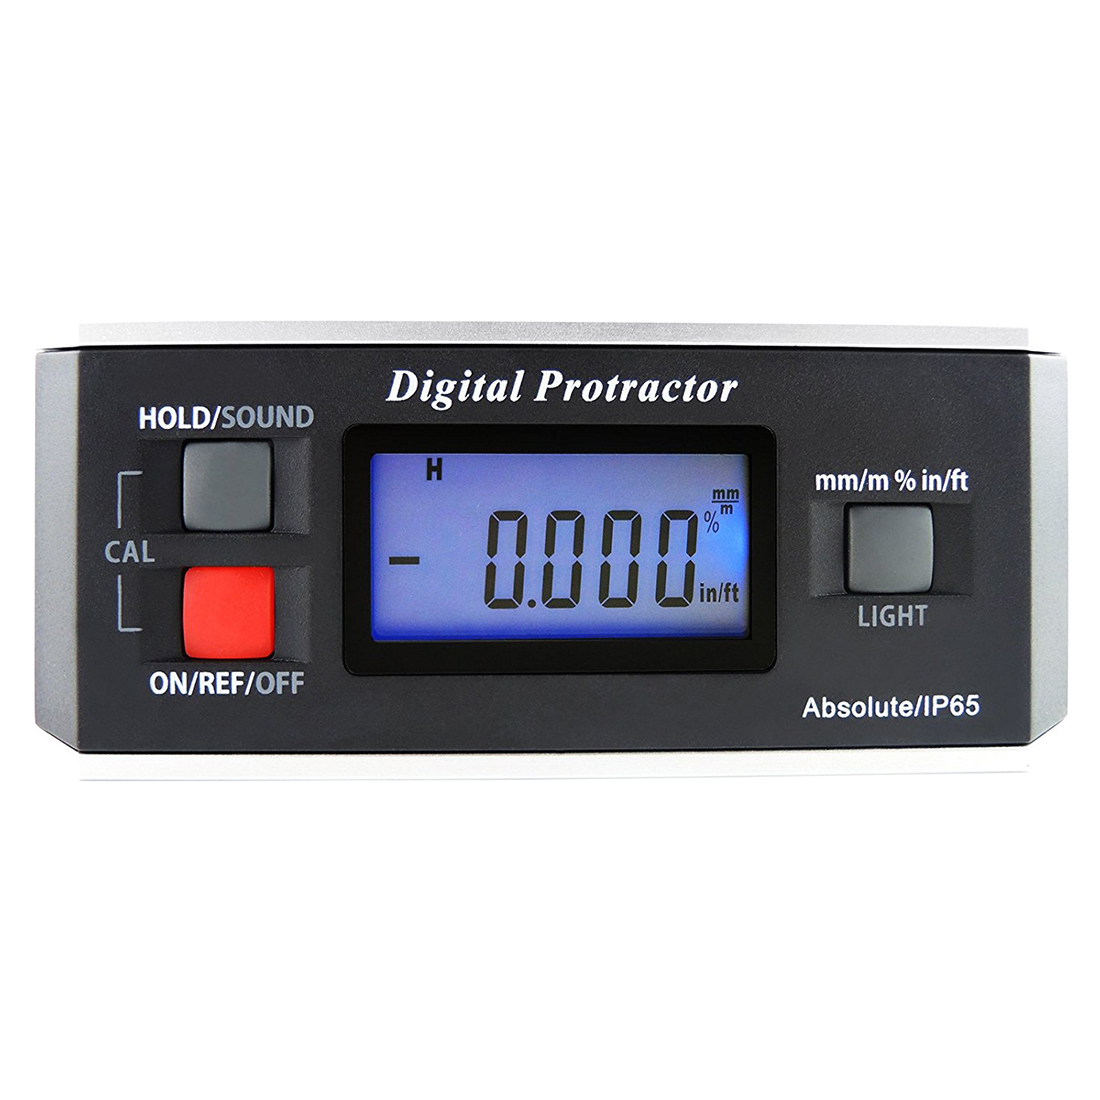 Mini Digital Inclinometer,360 degree Mini Digital Protractor Inclinometer Angle Meter with Base free shipping mini digital protractor bevel inclinometer box 0 360 stdjt 1201q